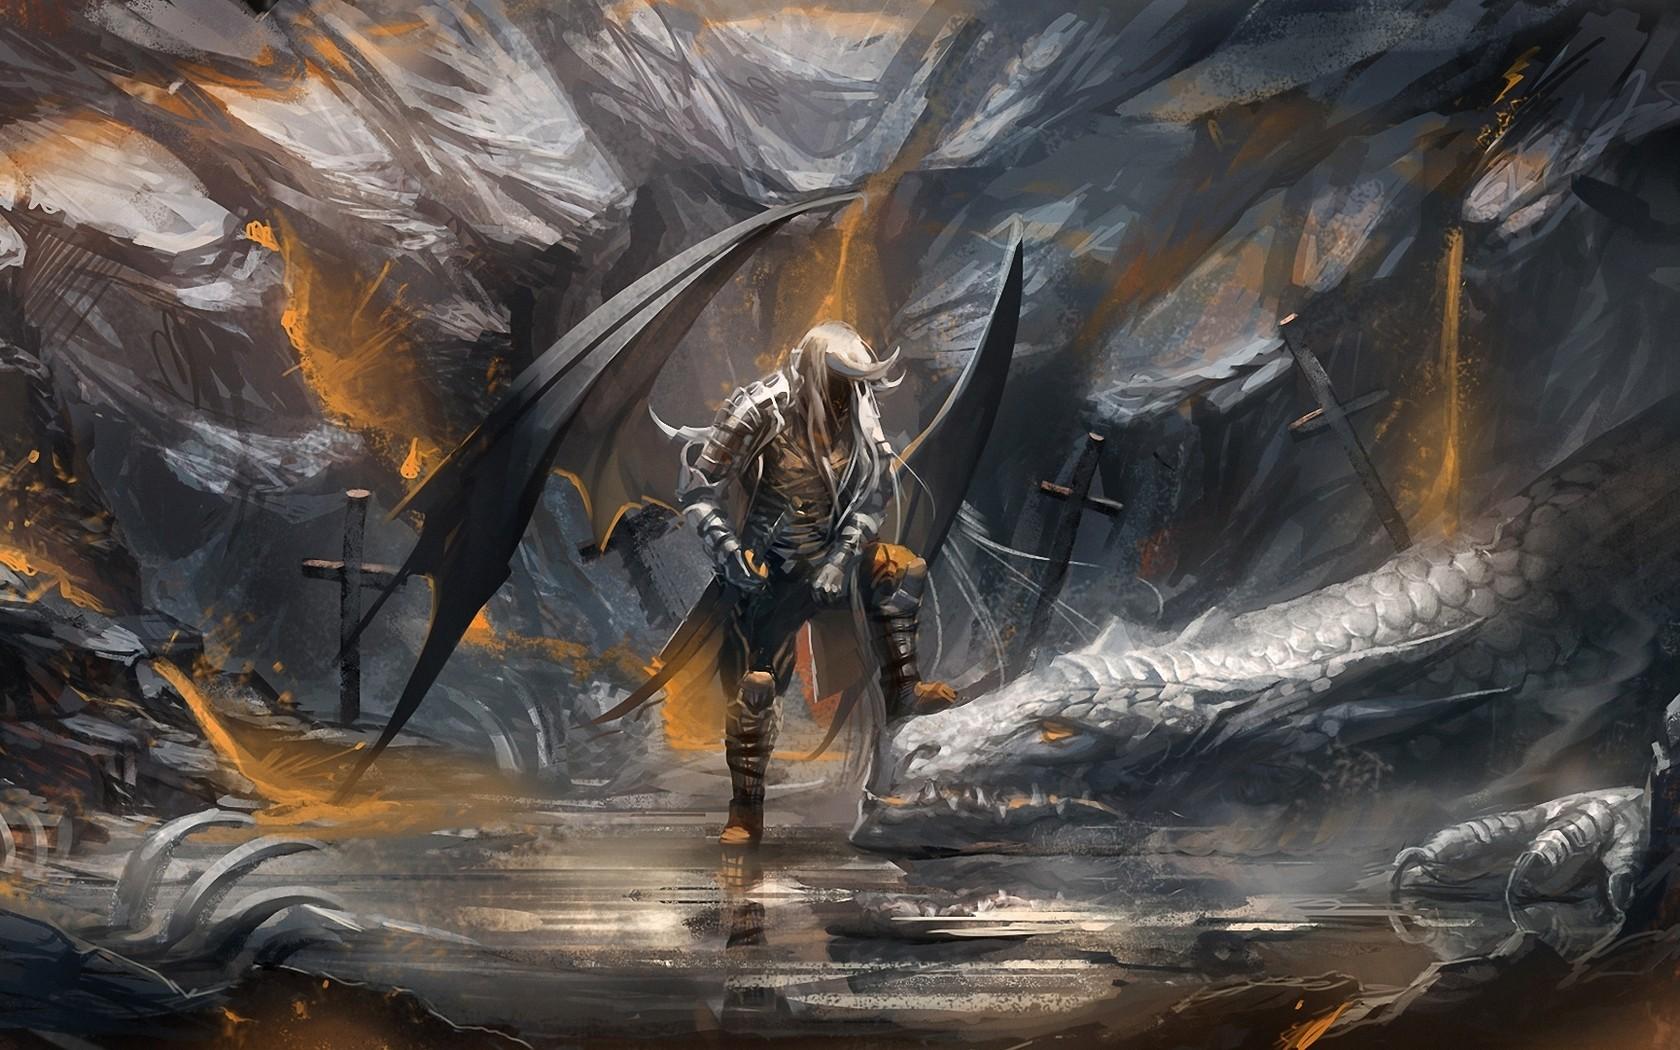 Angel warrior wallpaper and background image 1680x1050 - Demon wallpaper 4k ...